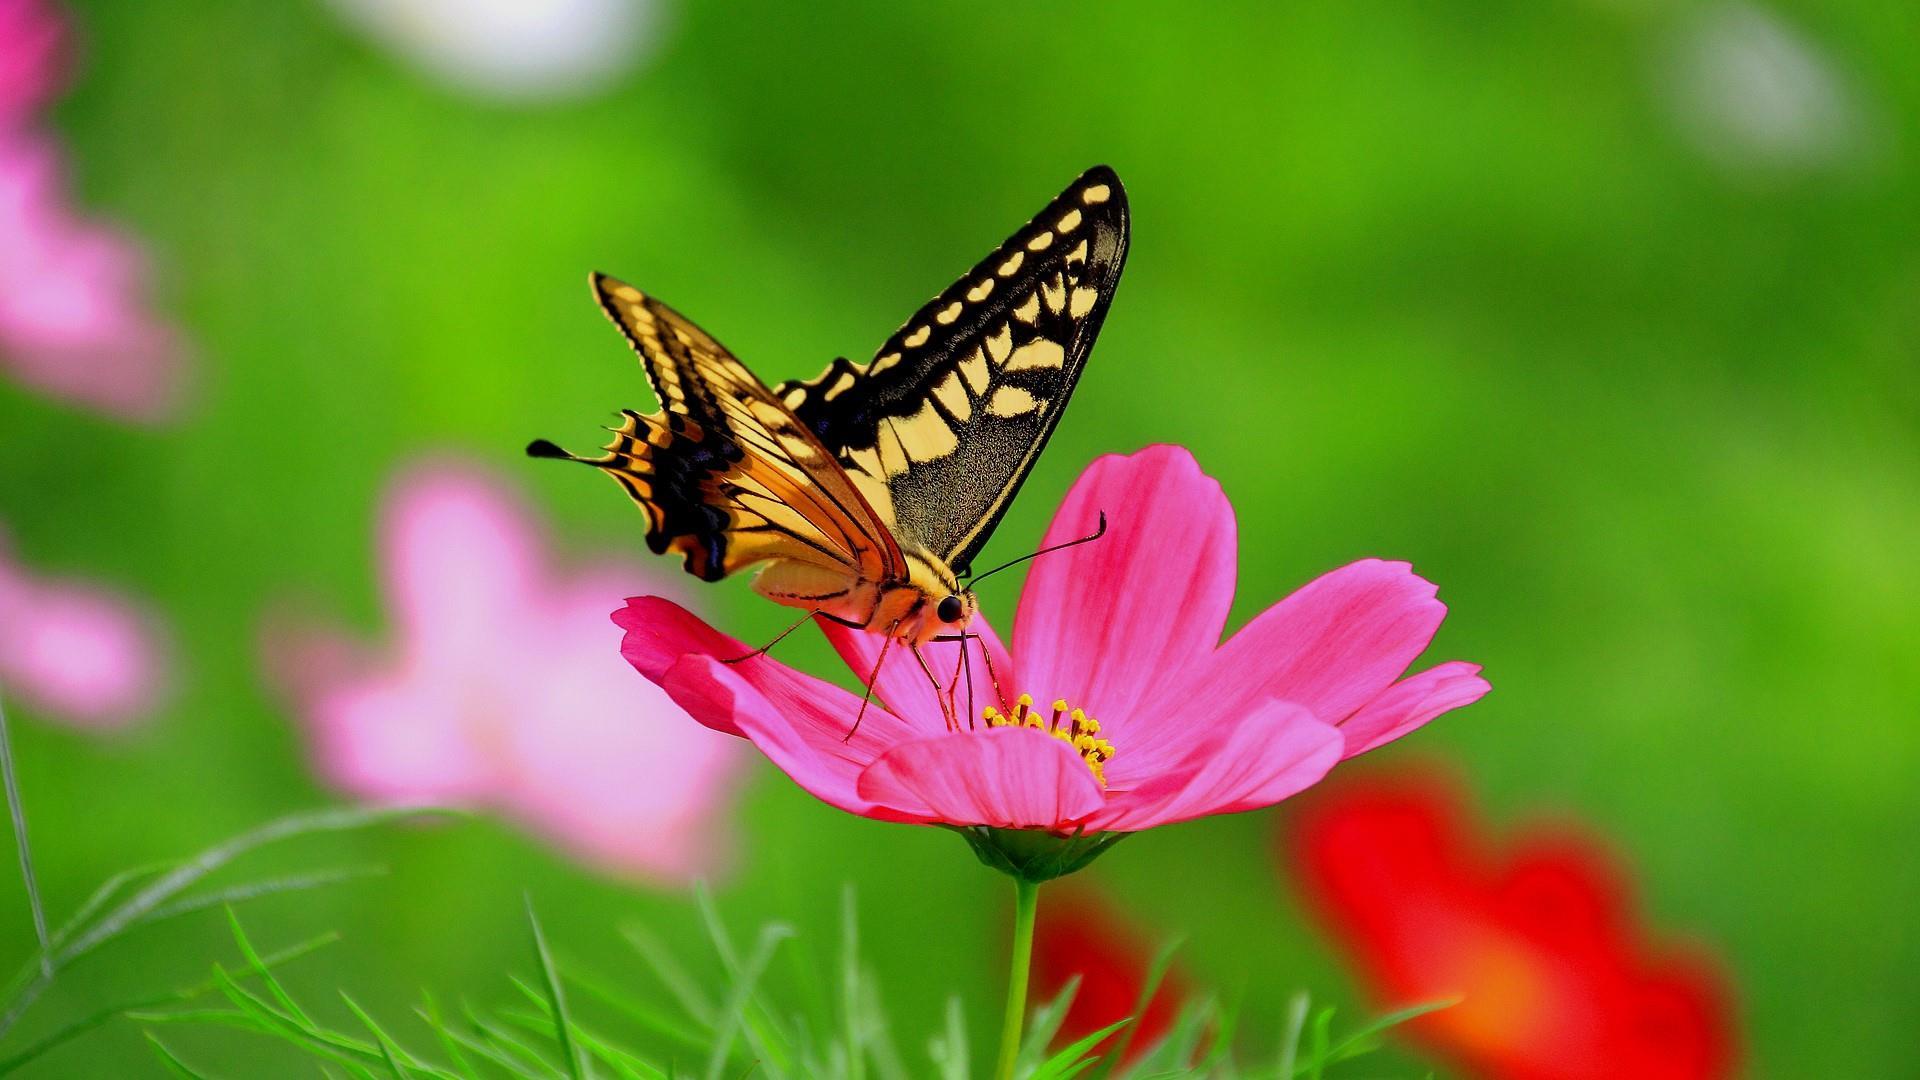 Butterfly on a pink flower wallpaper - backiee